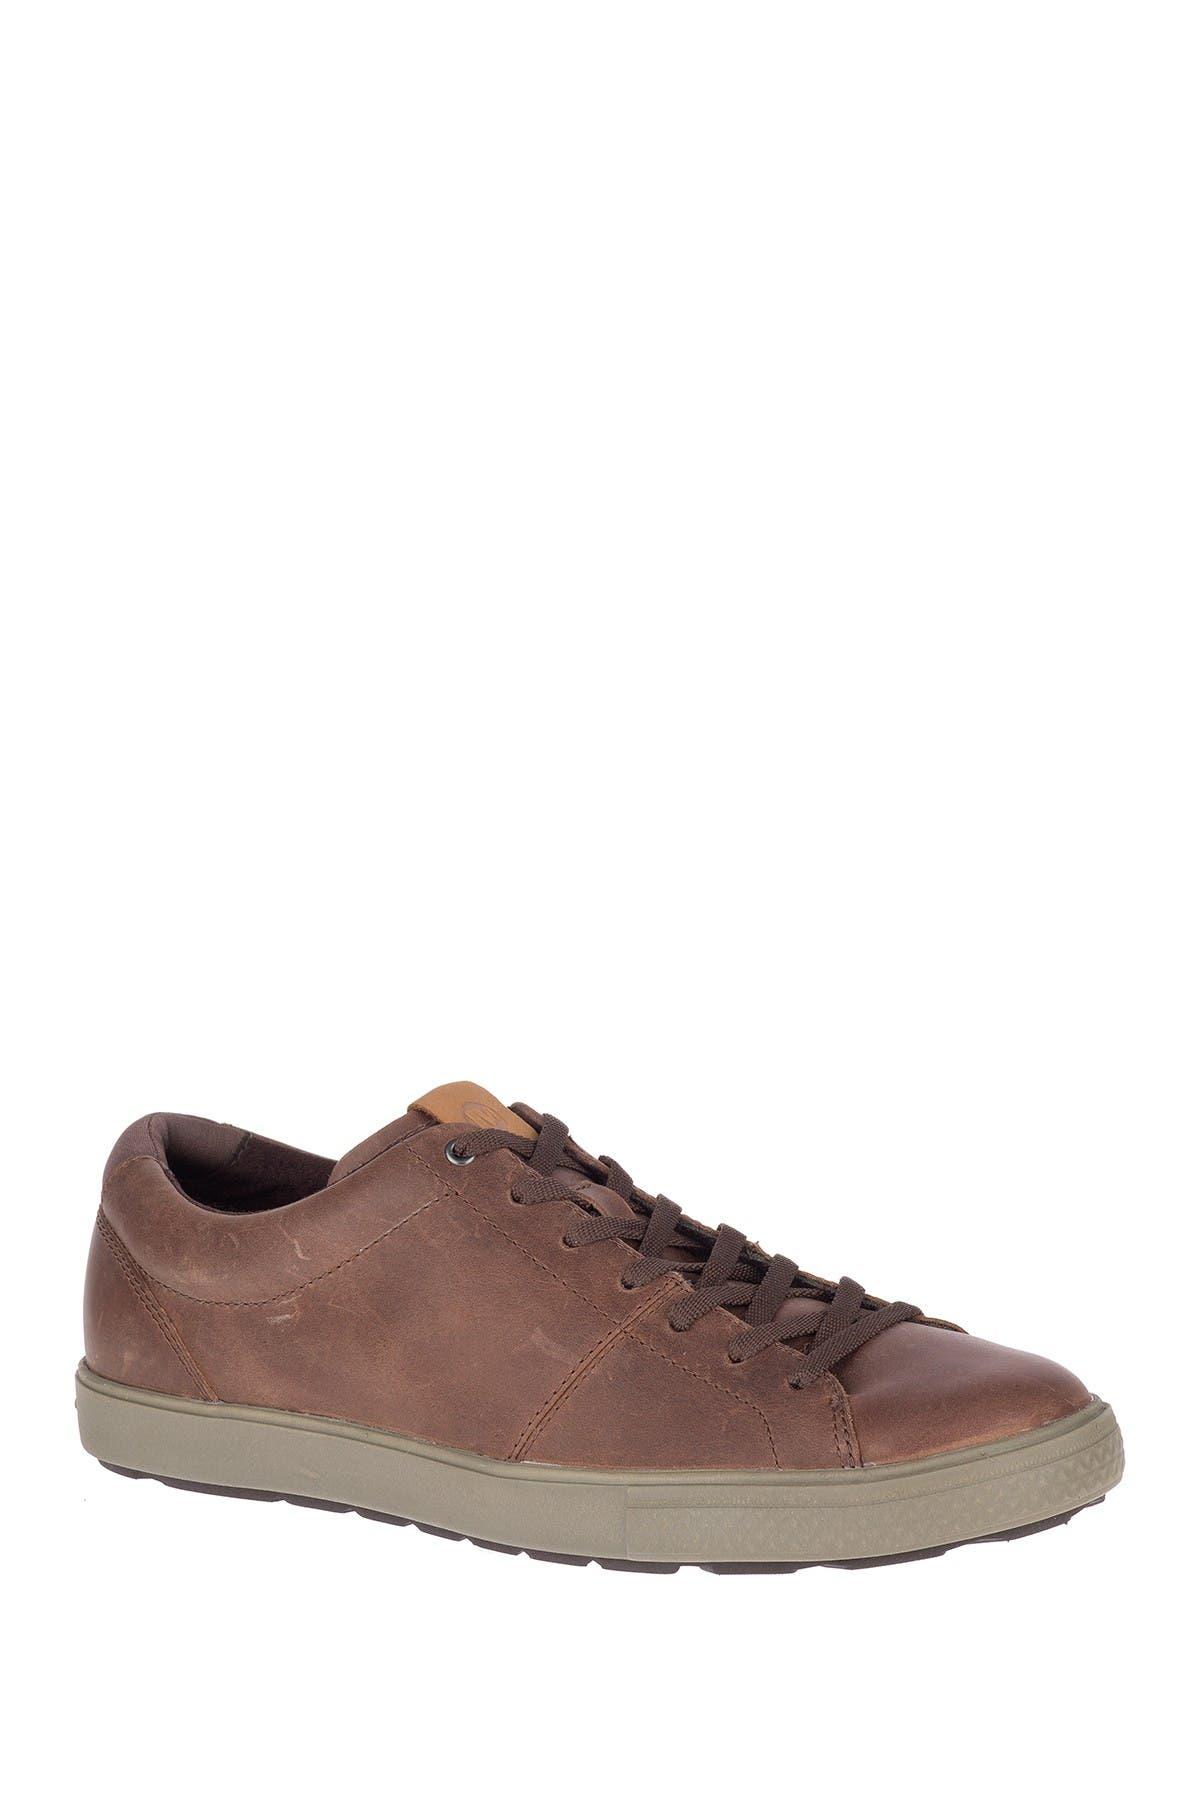 Image of Merrell Barkley Capture Leather Sneaker